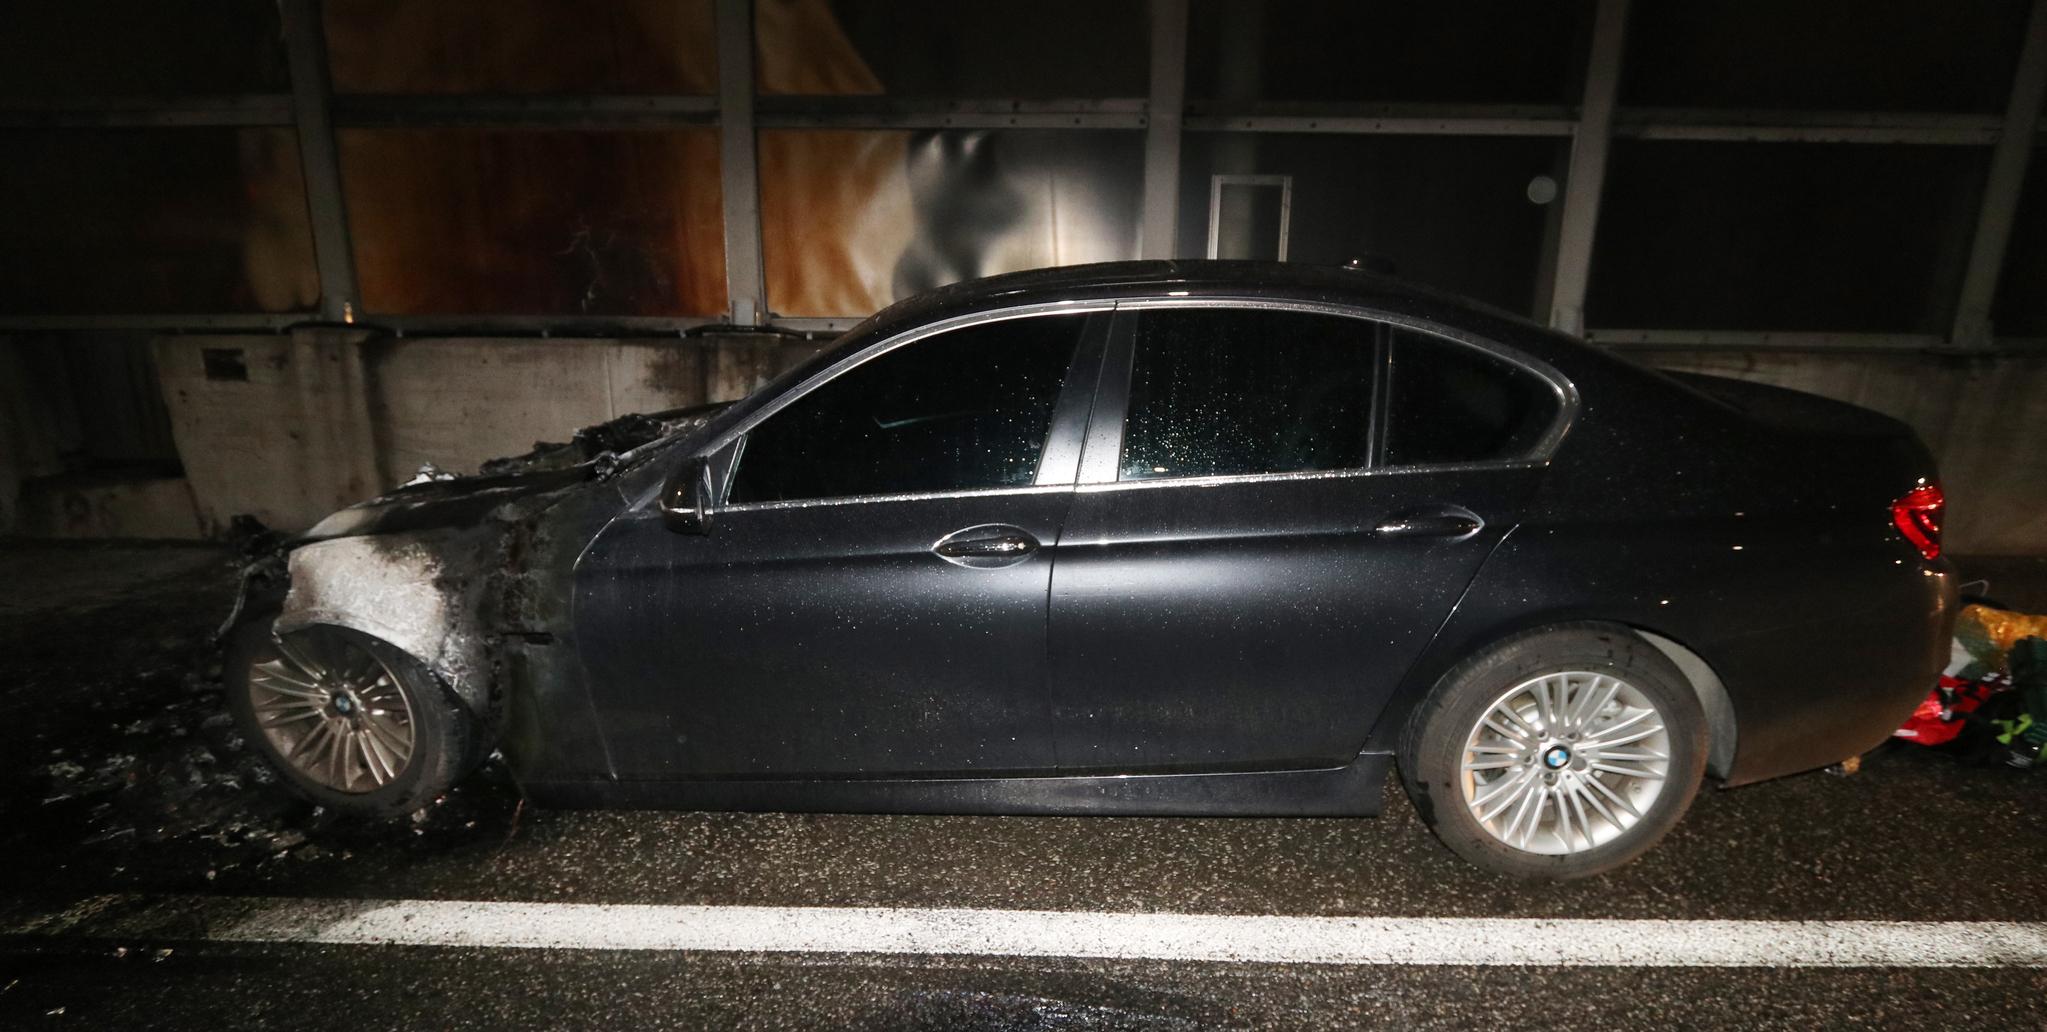 BMW 520d 승용차가 23일 오전 0시 10분쯤 인천시 남동구 서울외곽순환고속도로 장수 IC 인근에서 불이났다. 불에 탄 차량의 모습. [사진 부평소방서]